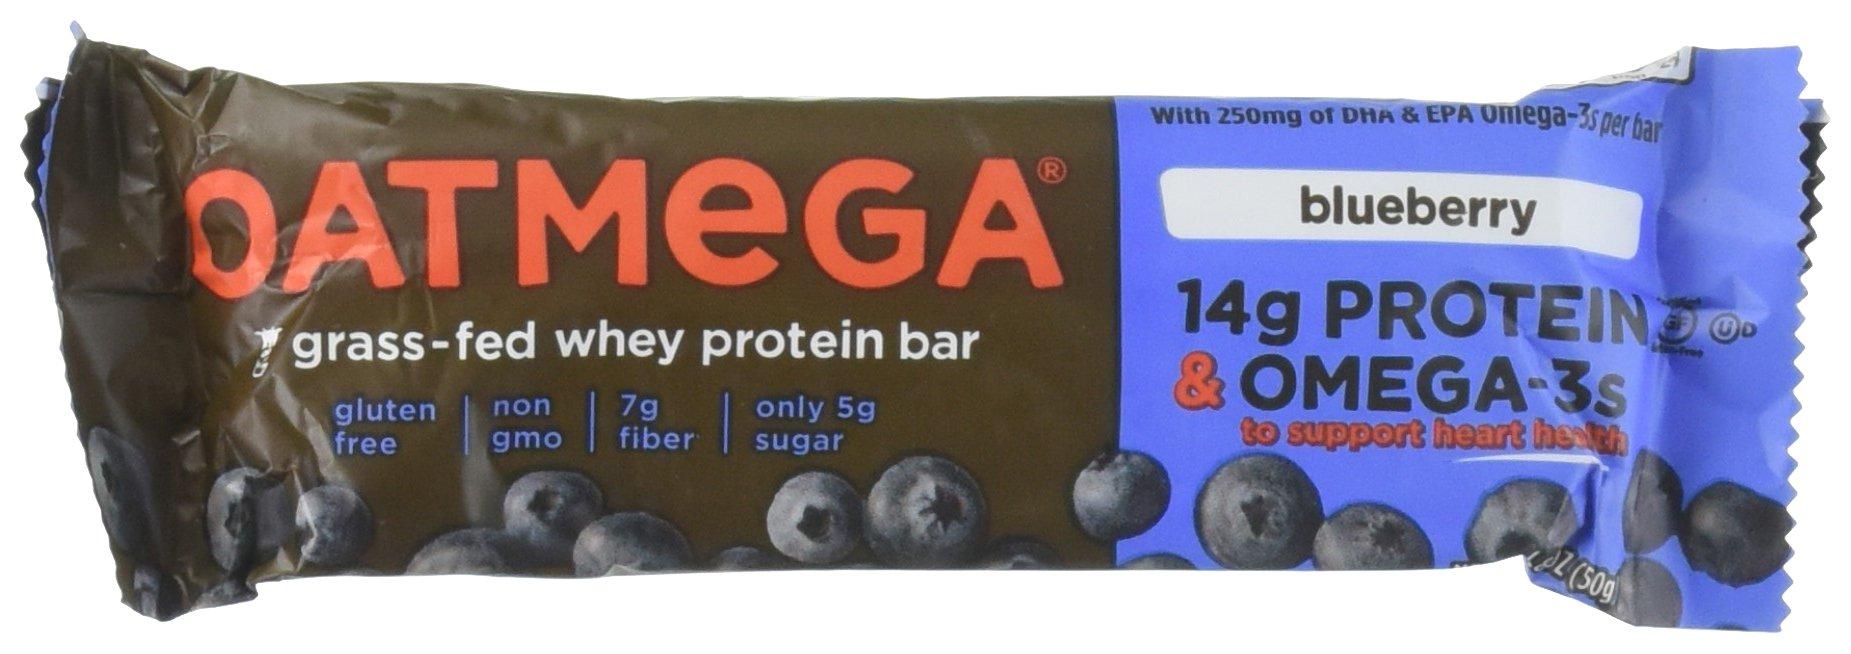 Oatmega Protein Bar, Blueberry, 1.8 Ounce, 12 Count